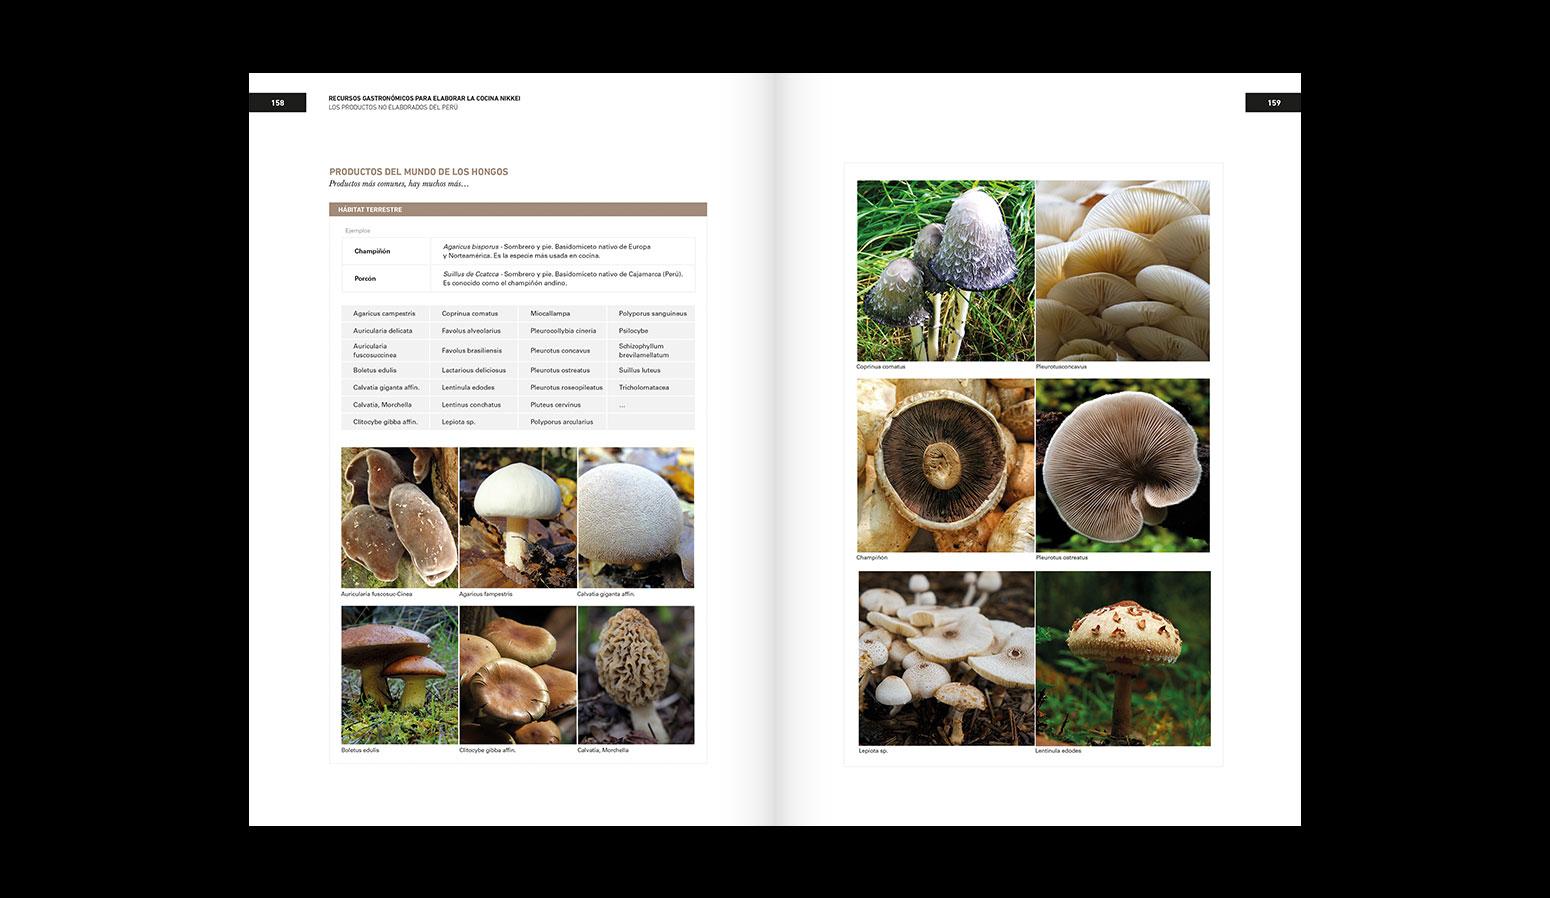 Diseño del libro de cocina Nikkei para Bullipedia - Ferran Adrià, elBullifoundation